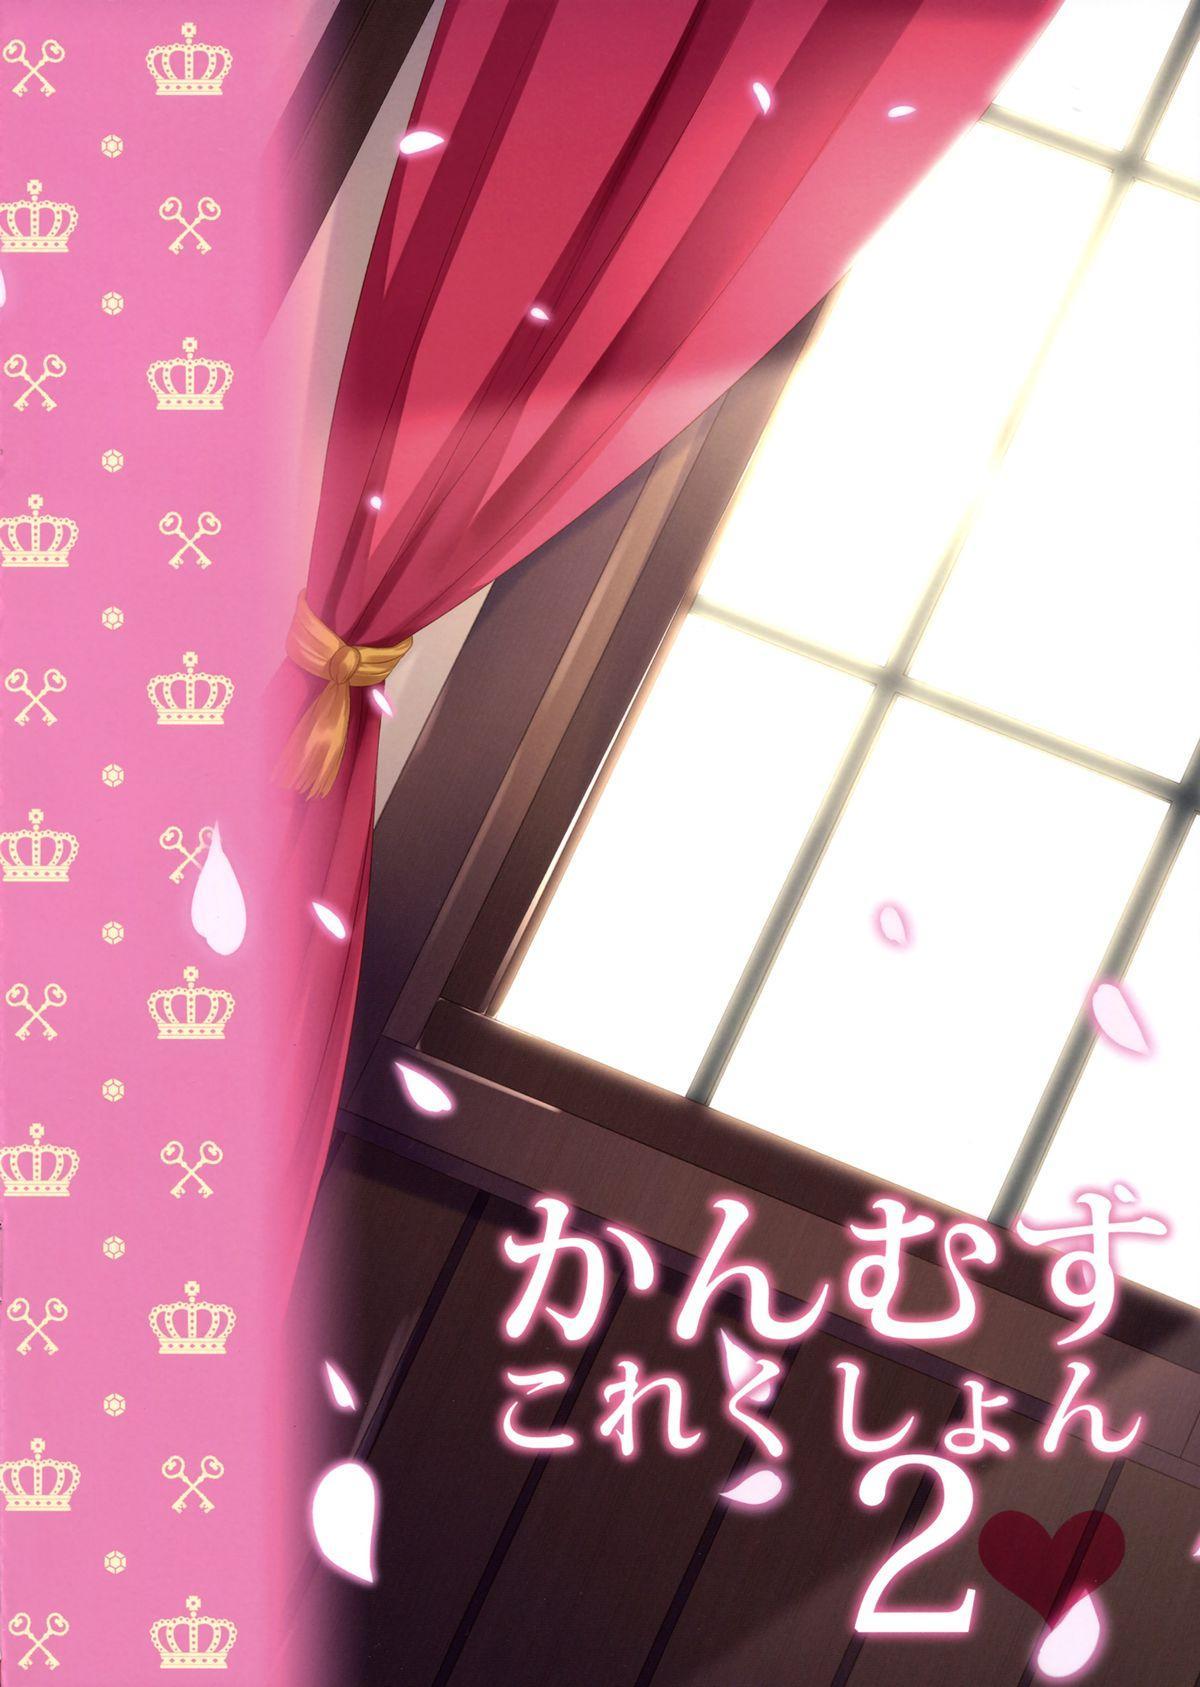 Kanmusu Collection 2 12